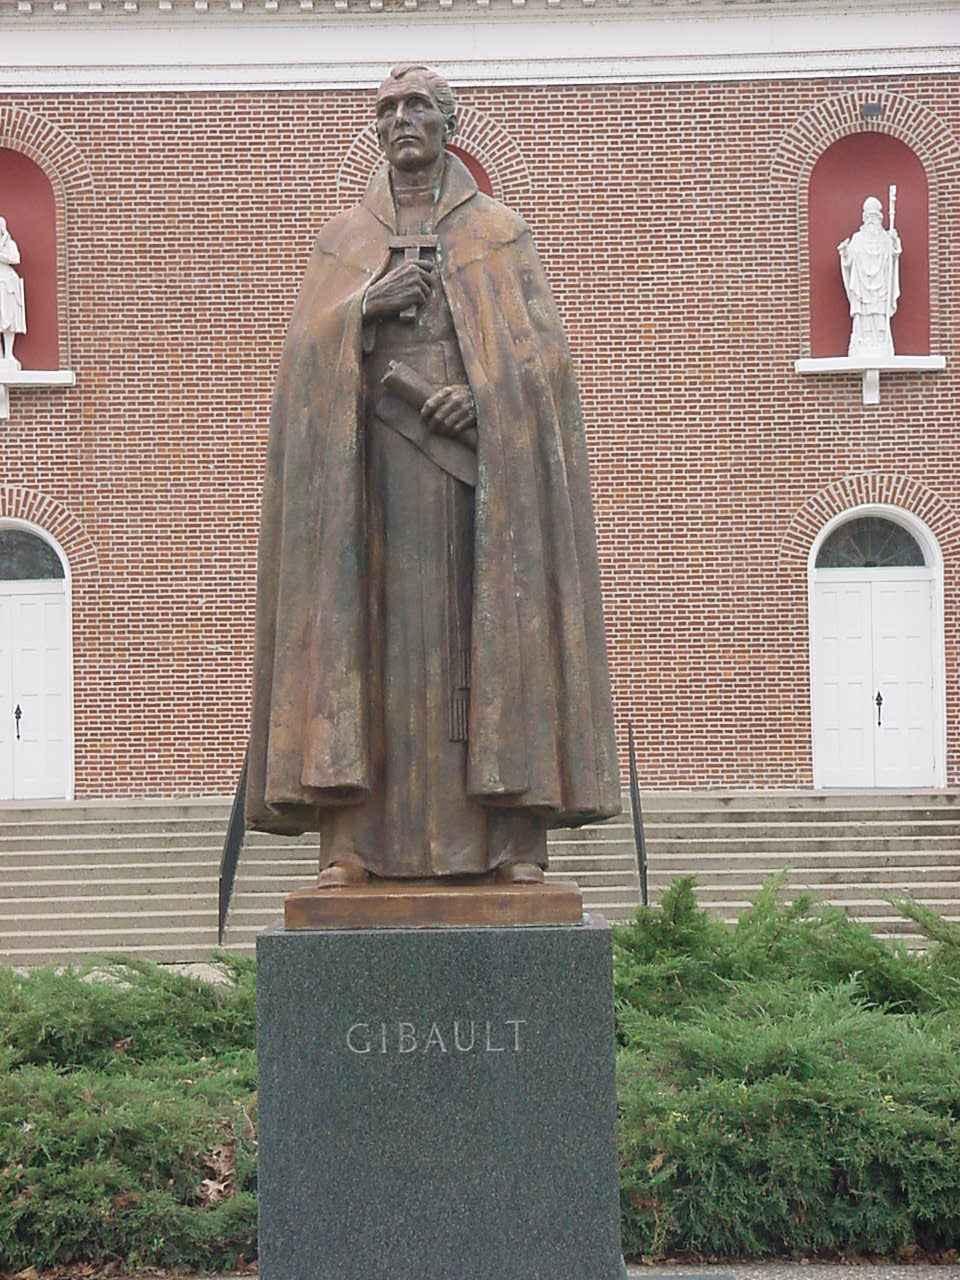 Father Gibault Memorial Statue